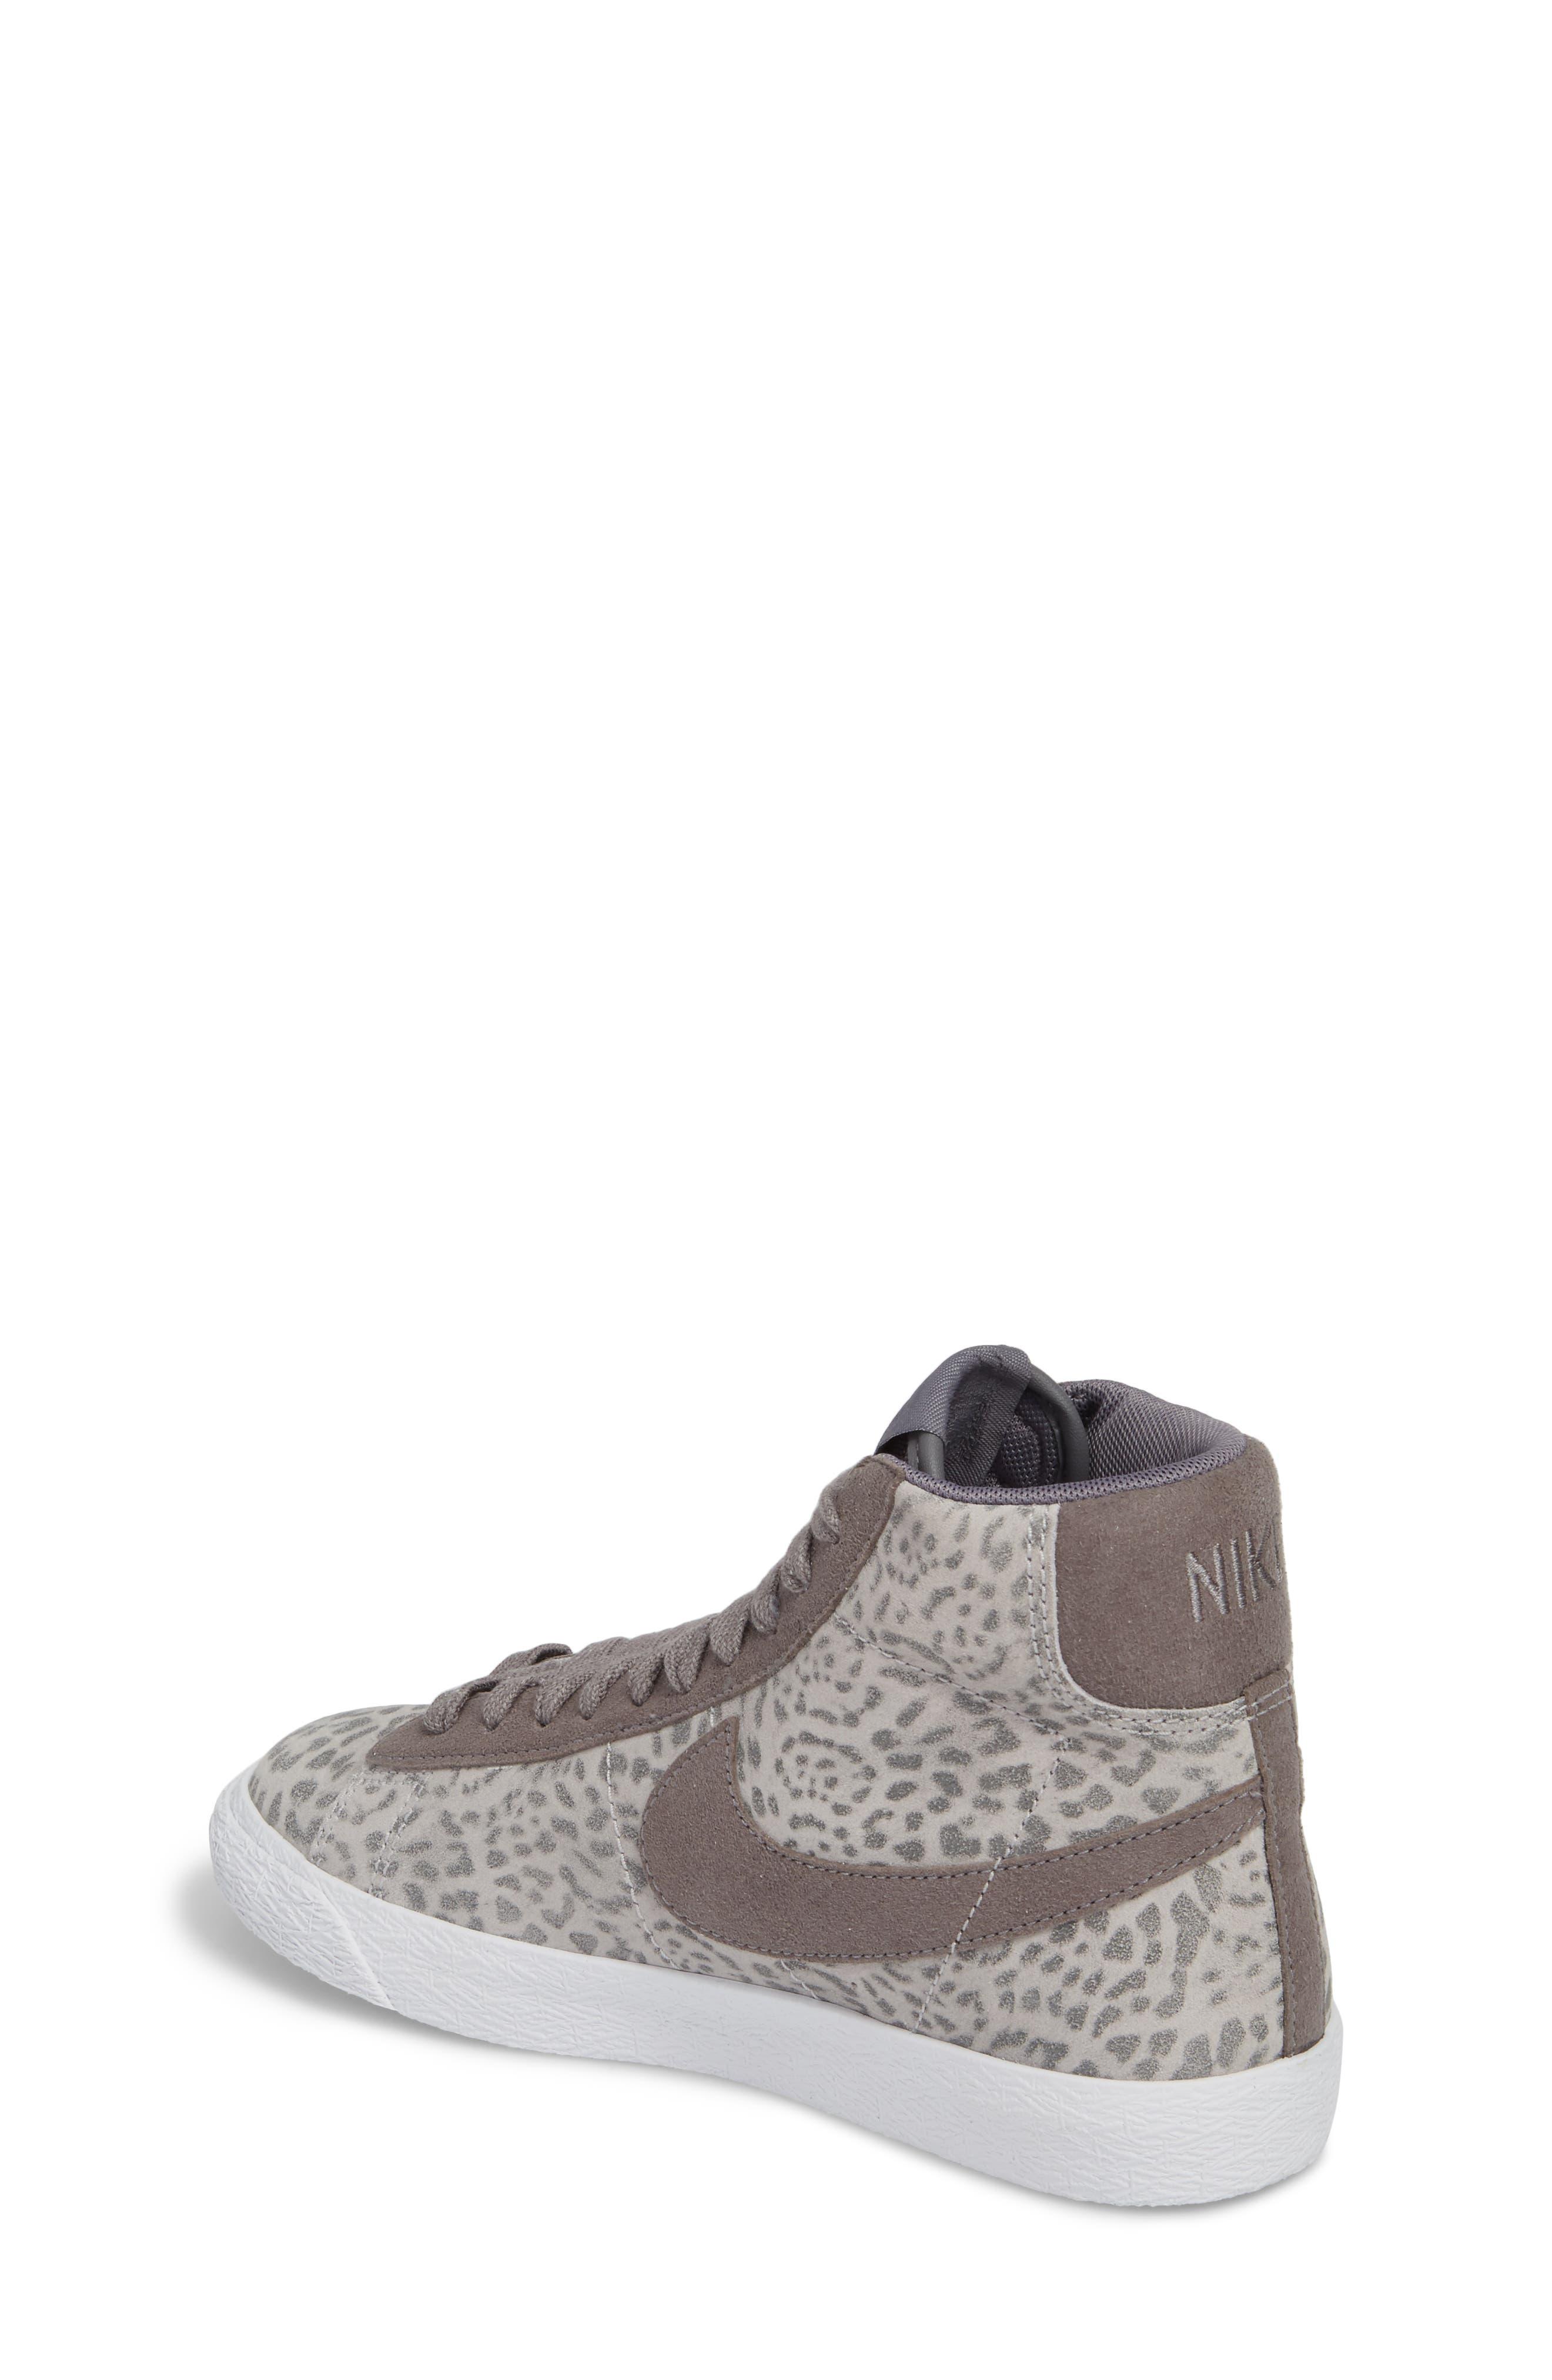 Blazer Mid SE High Top Sneaker,                             Alternate thumbnail 4, color,